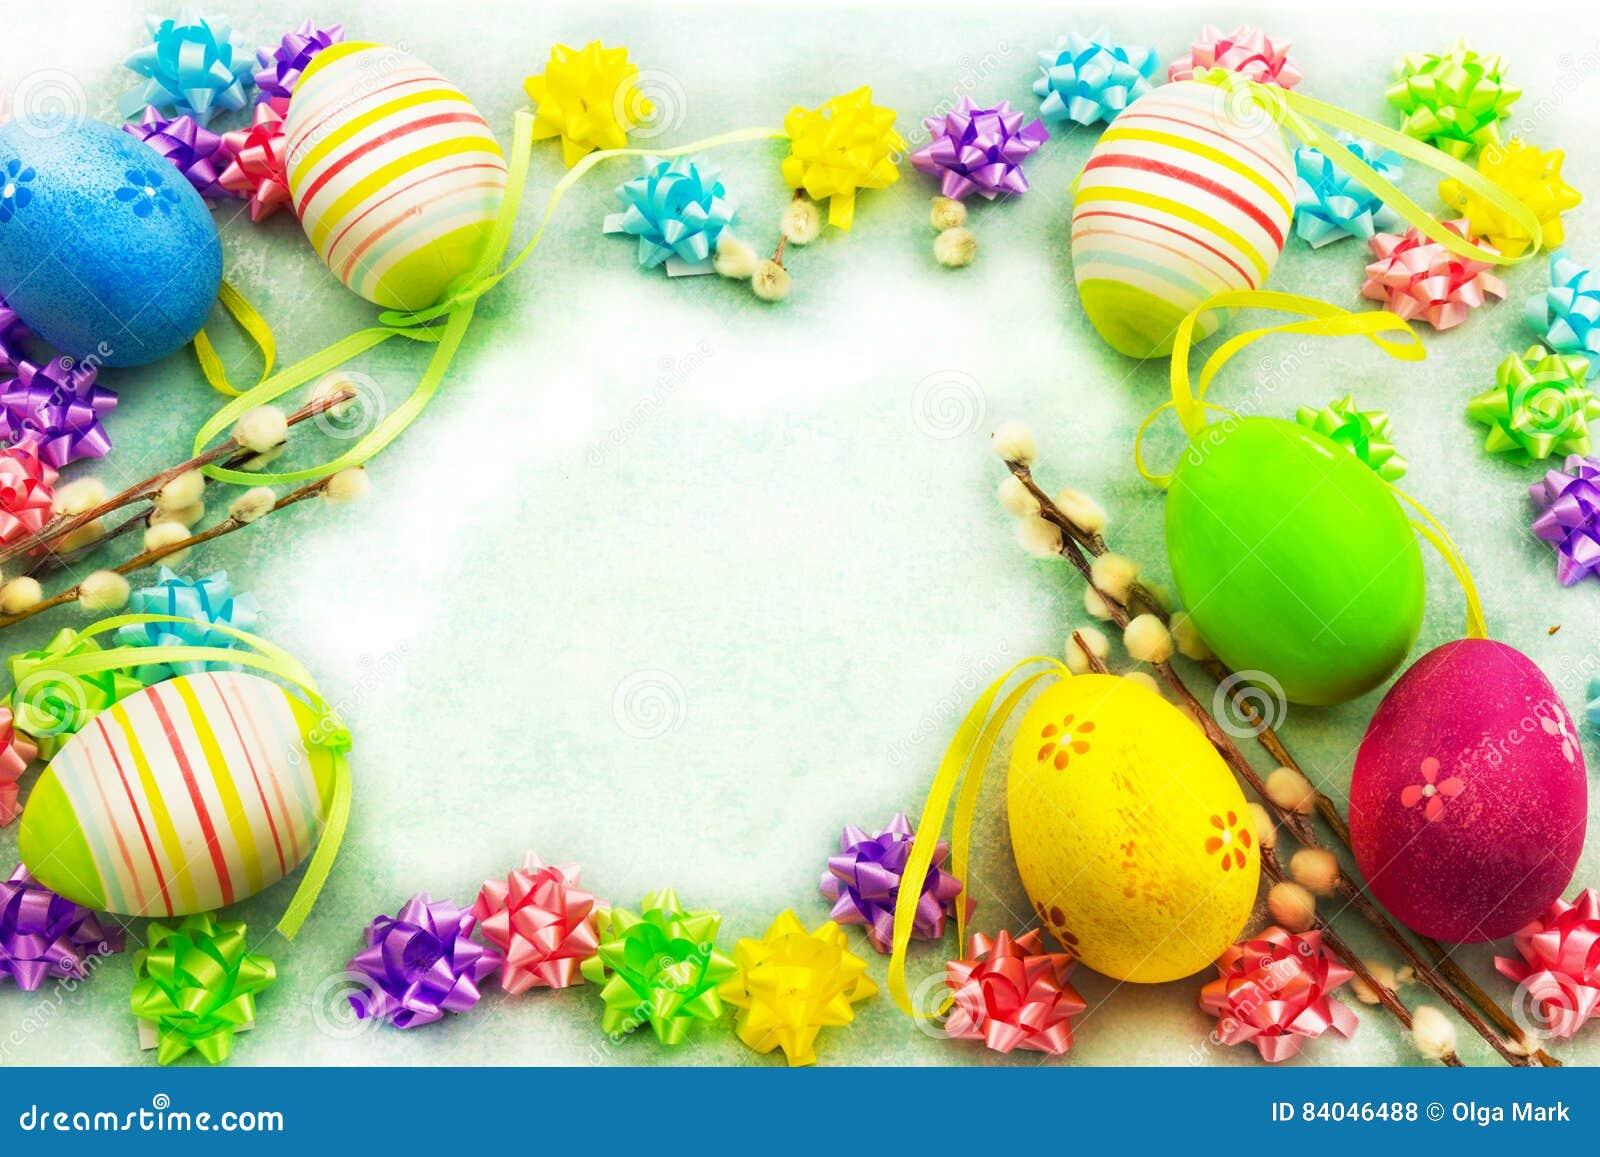 Bunte Eier Ostern, Rahmen stockfoto. Bild von farbe, feier - 84046488